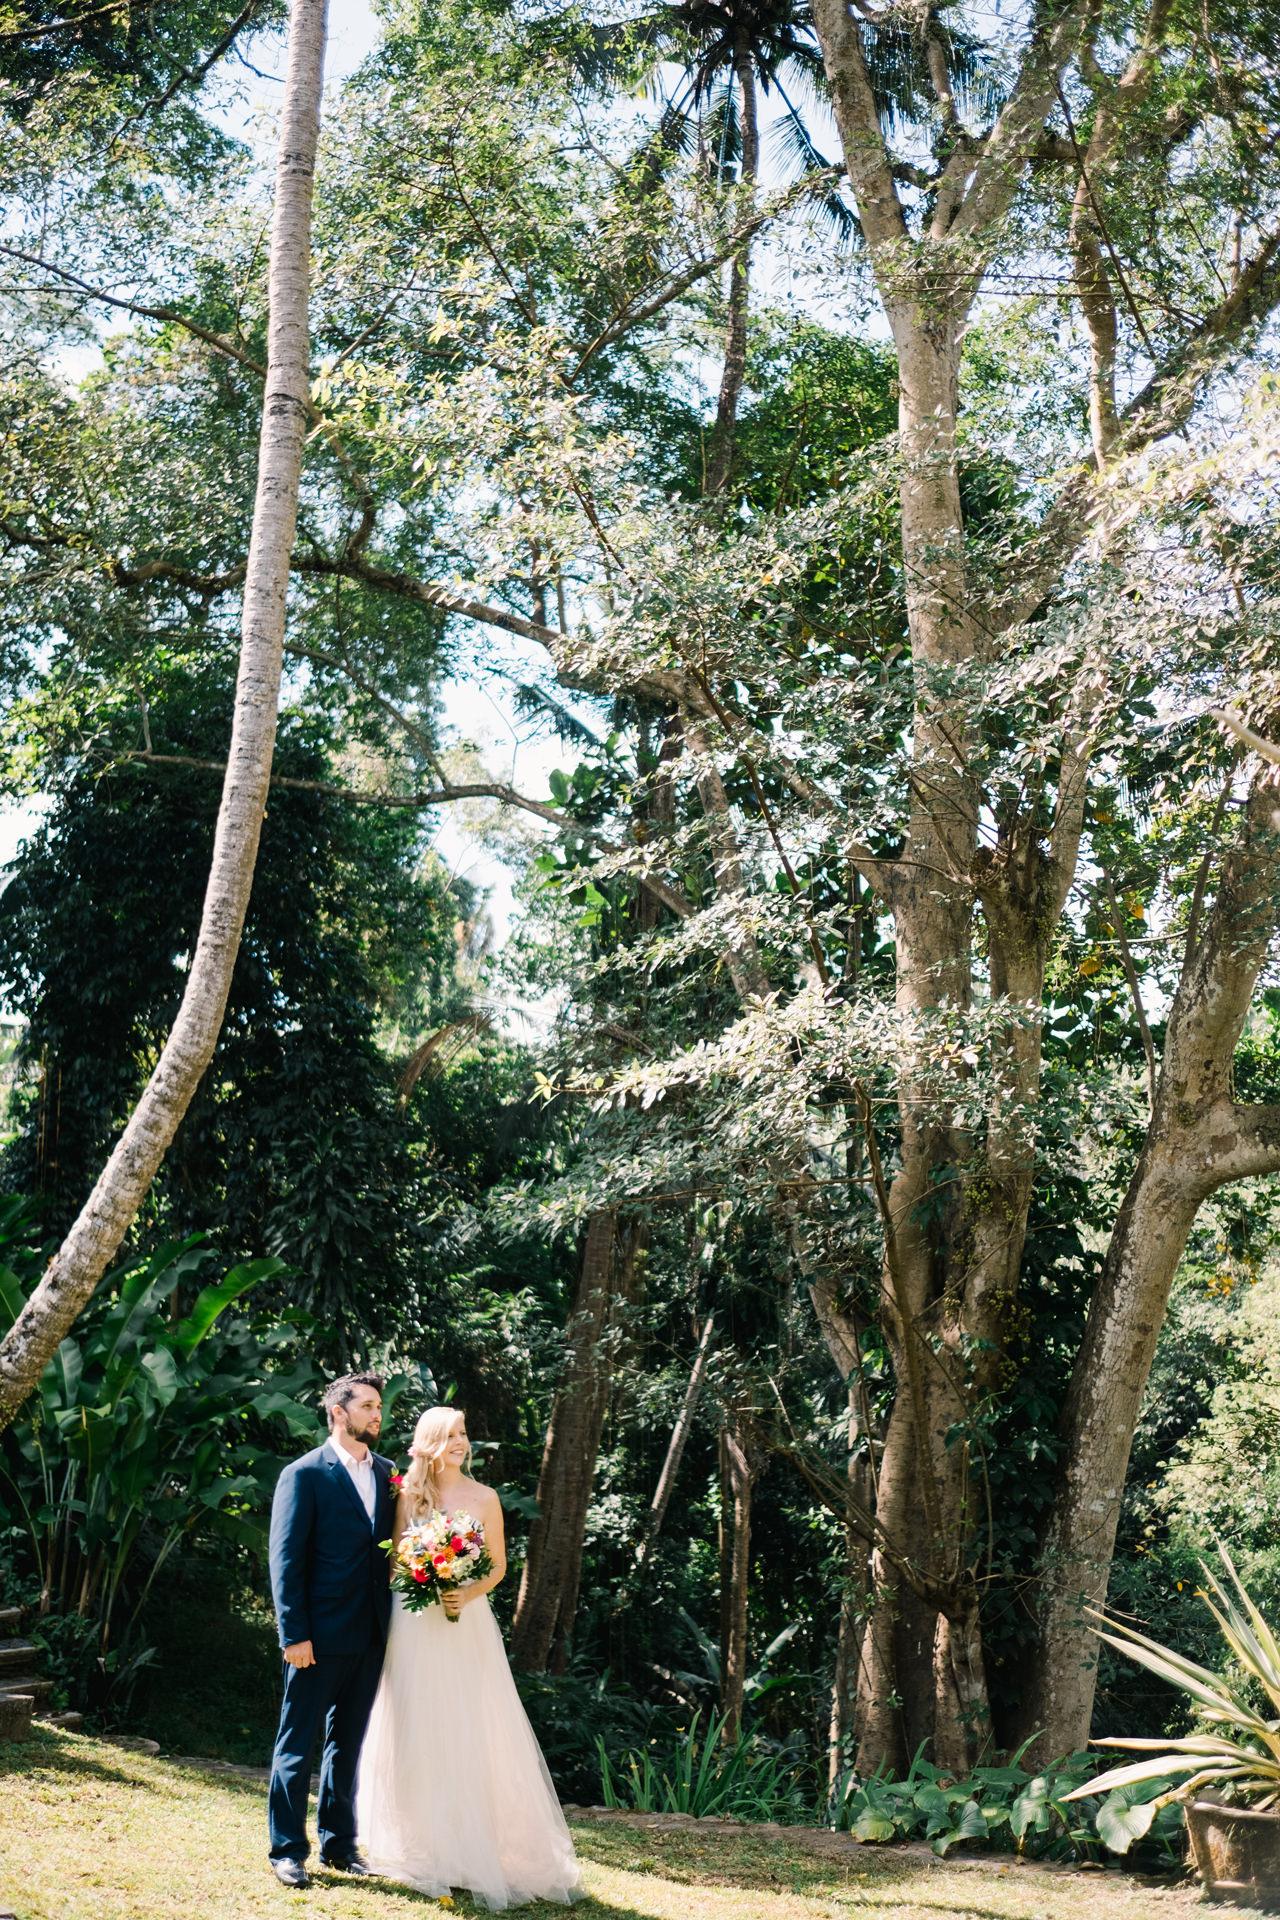 M&D: Greenery Ubud Wedding at Villa Beji Indah 12